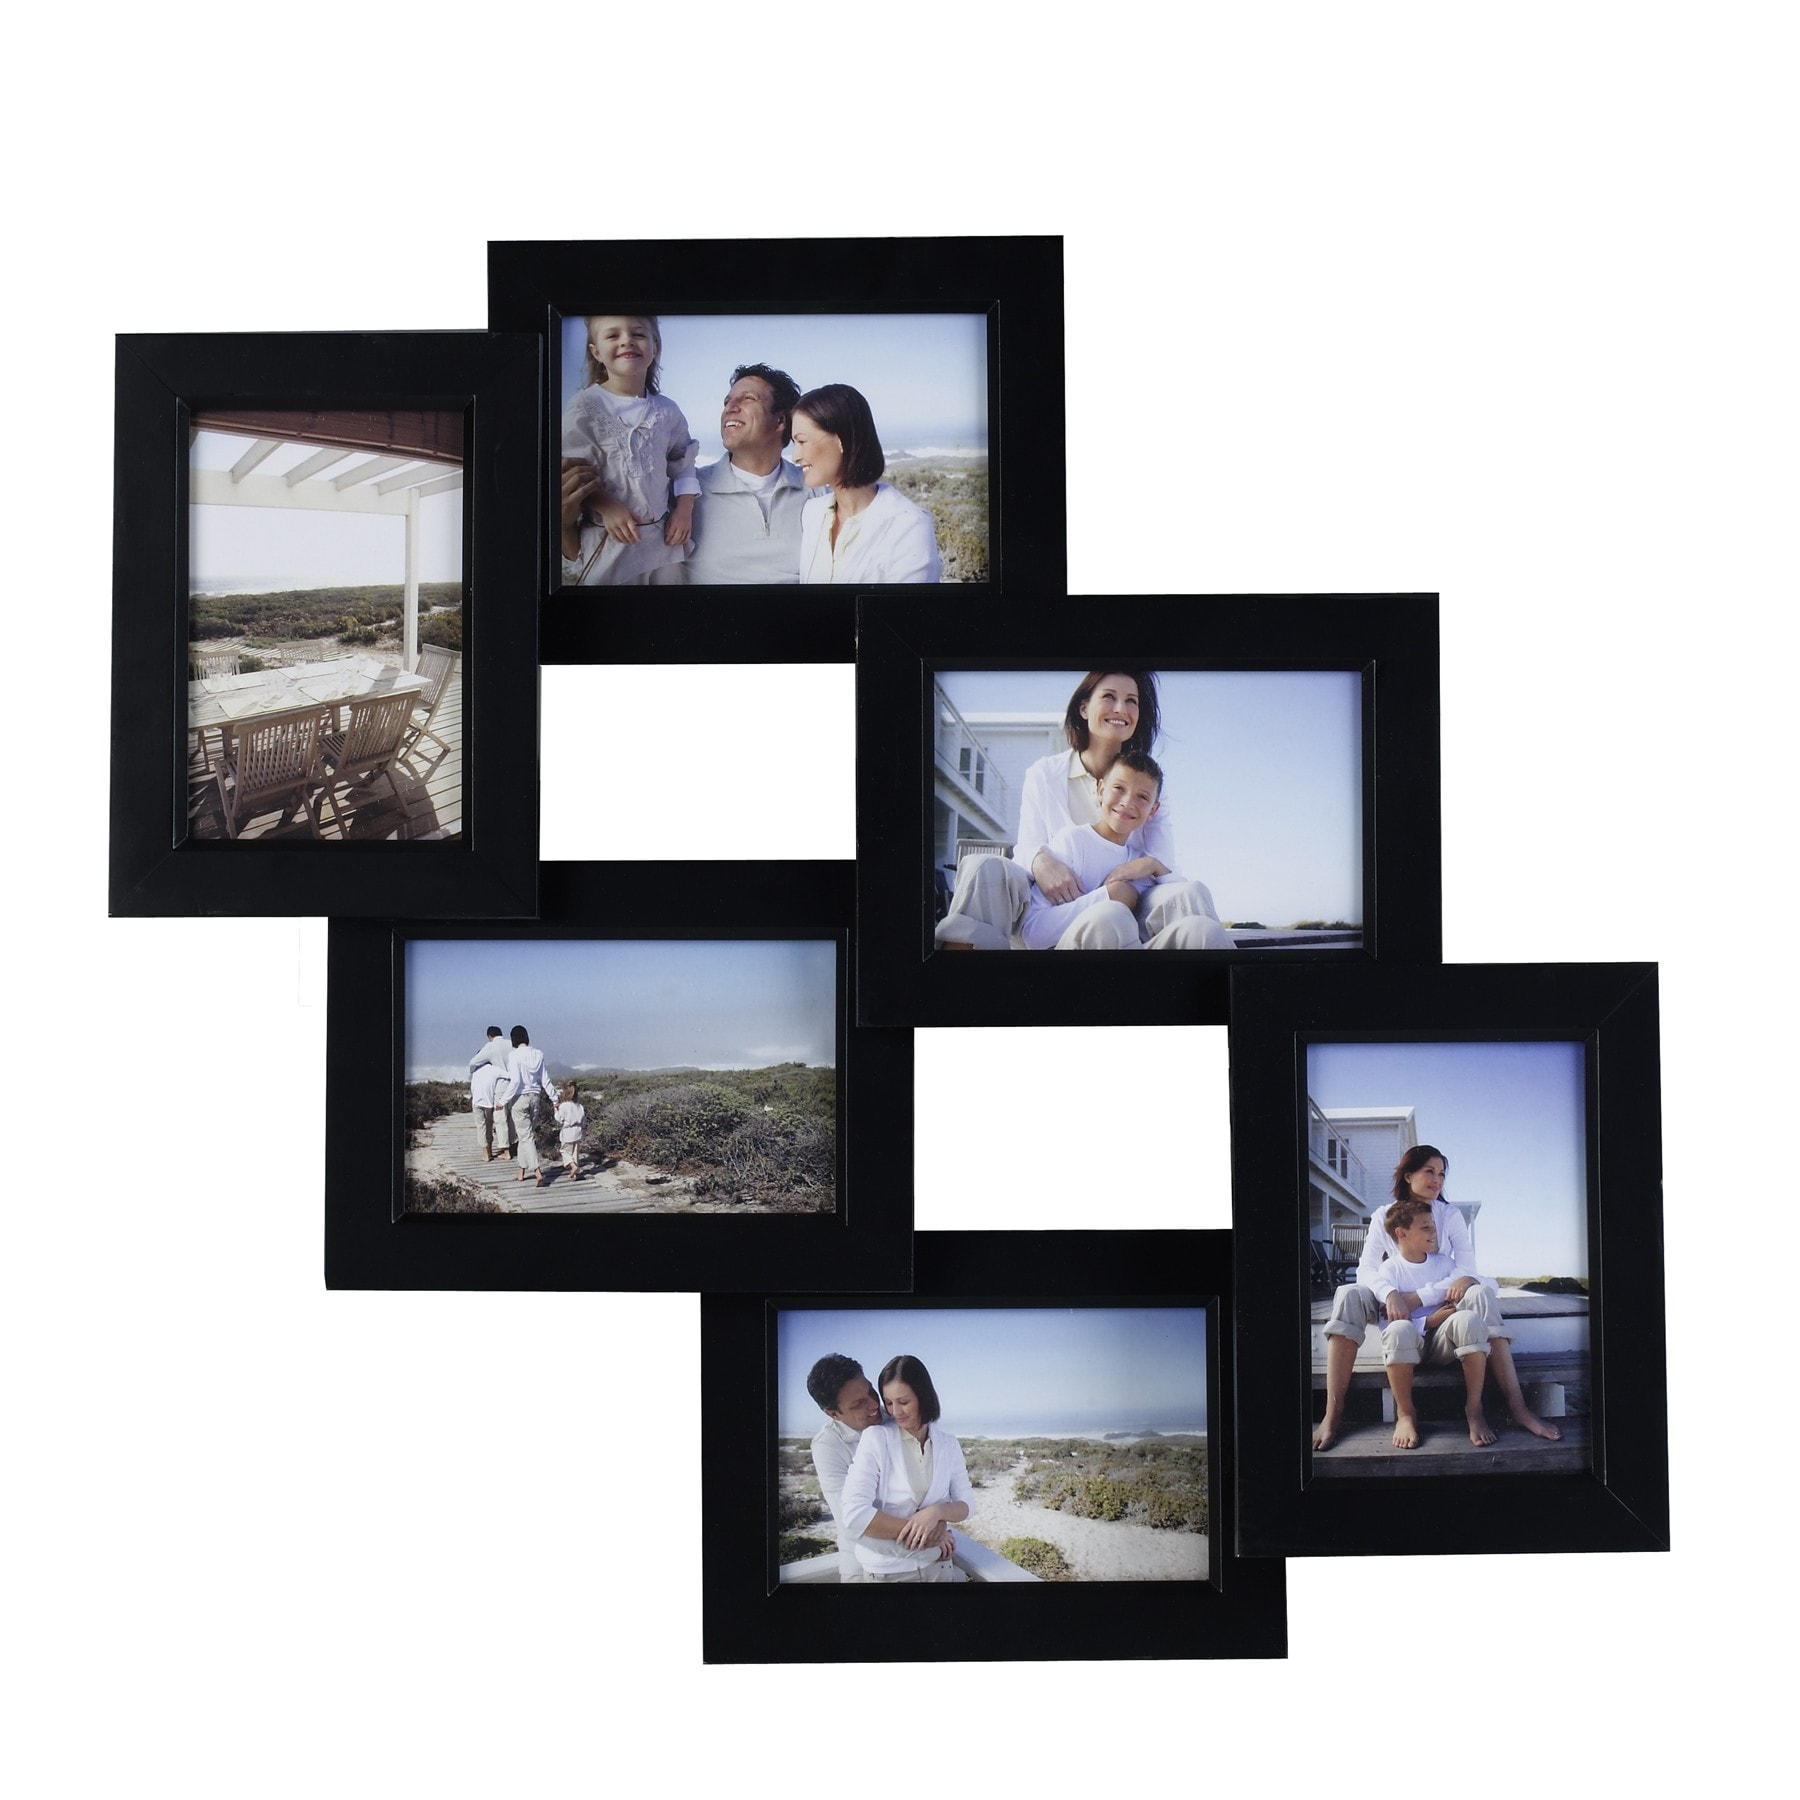 mellanco 6 photo black collage frame 13996002 shopping great deals on photo. Black Bedroom Furniture Sets. Home Design Ideas